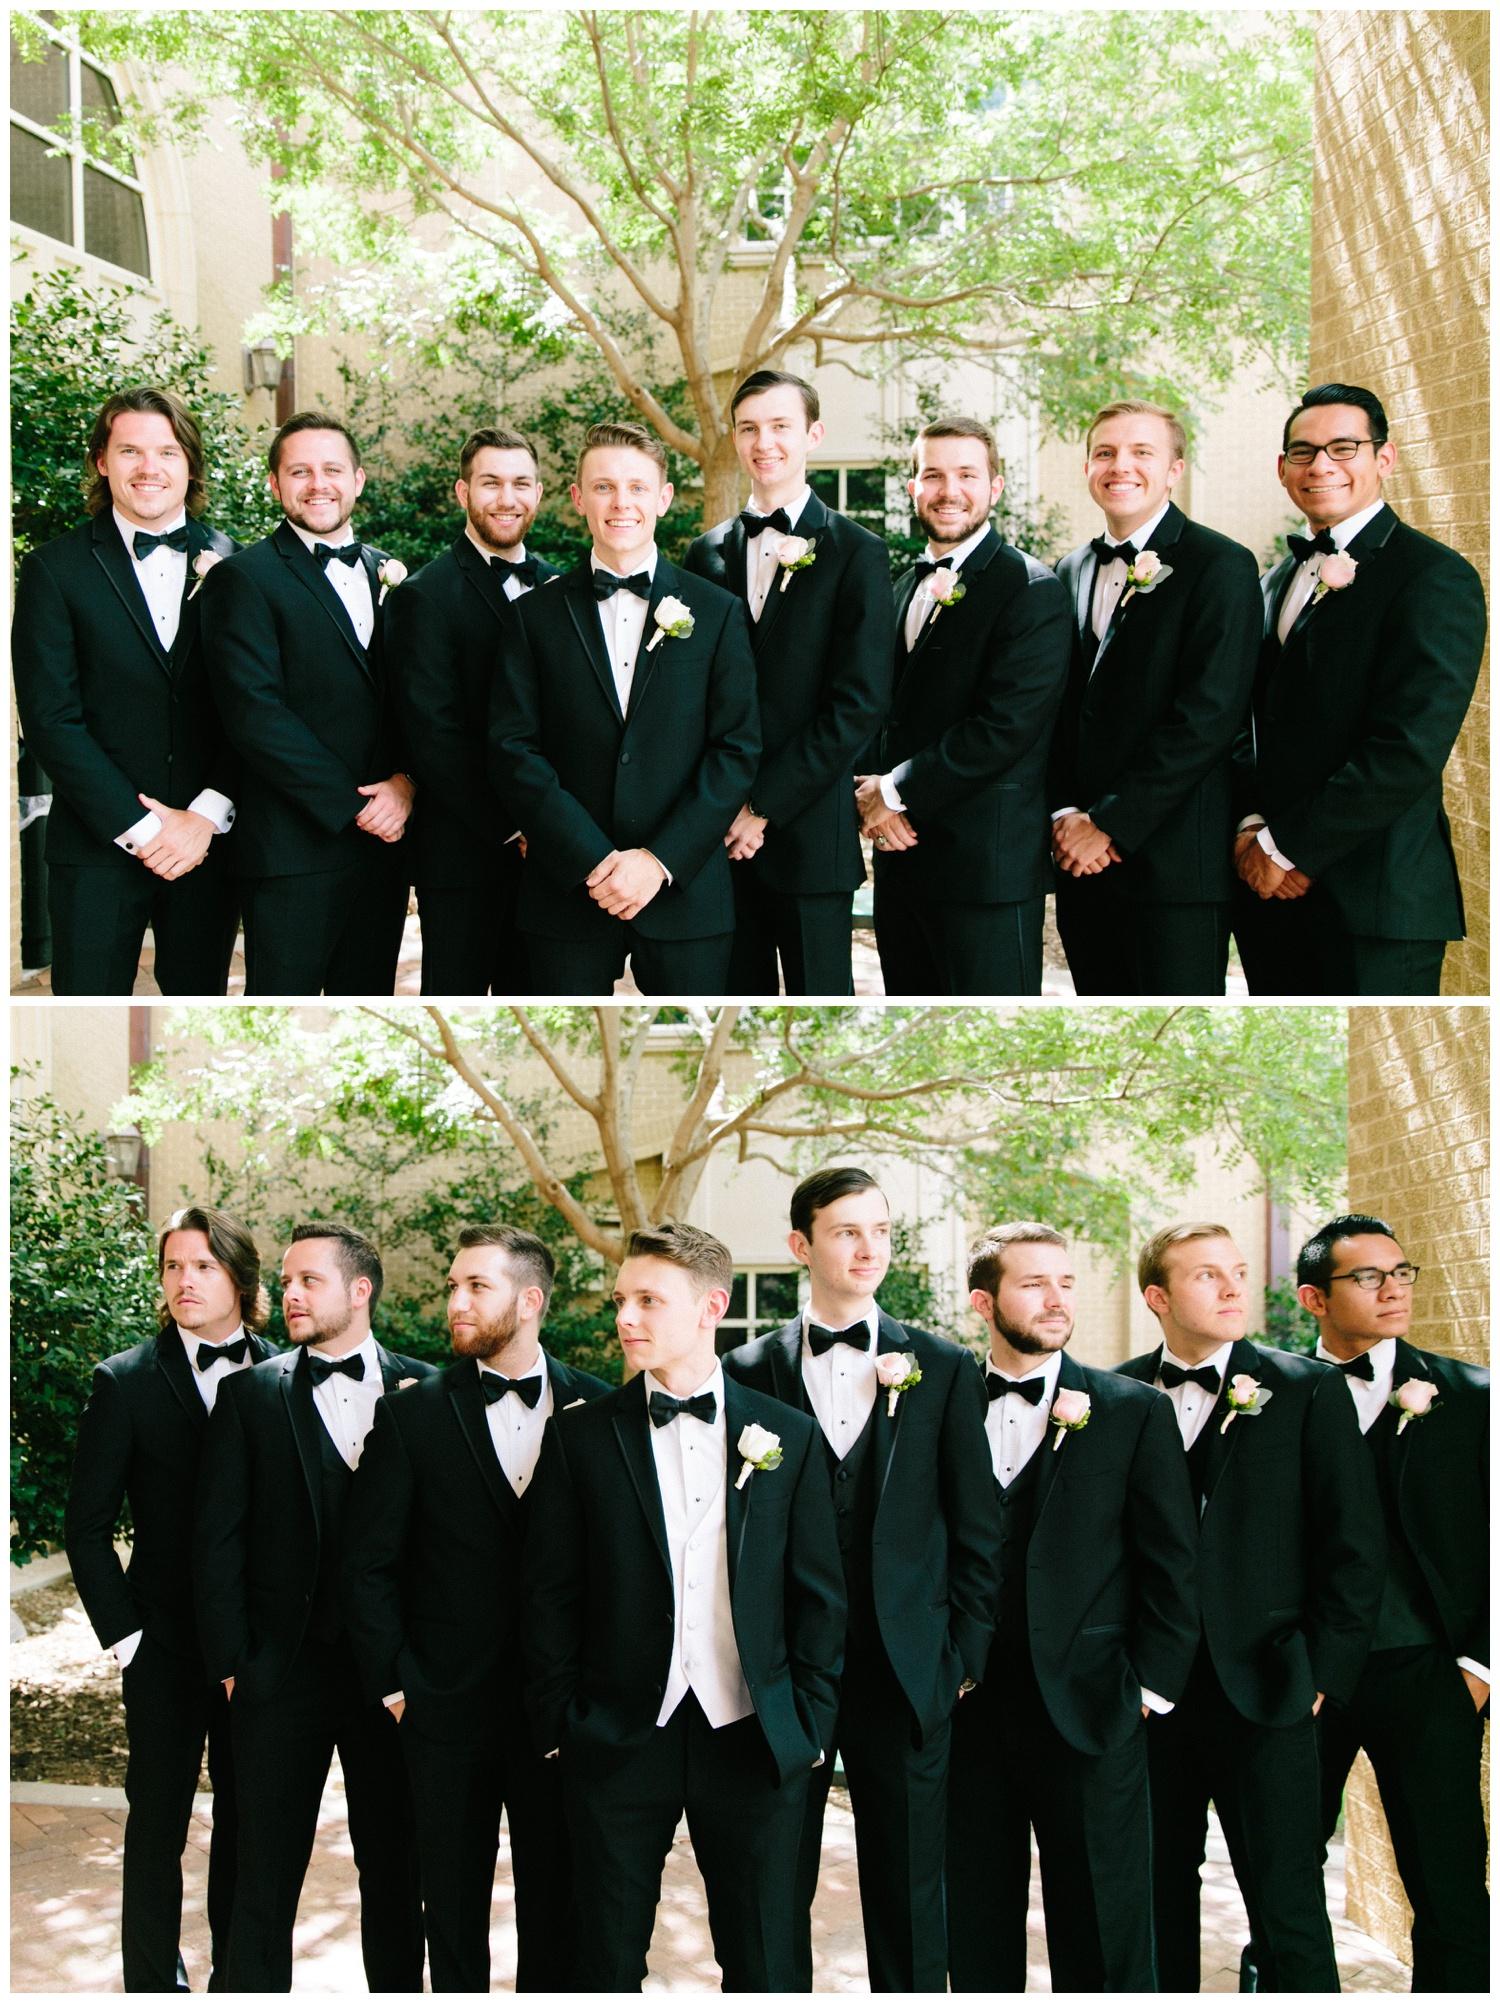 classic-country-club-wedding-lubbock-texas-37.jpg